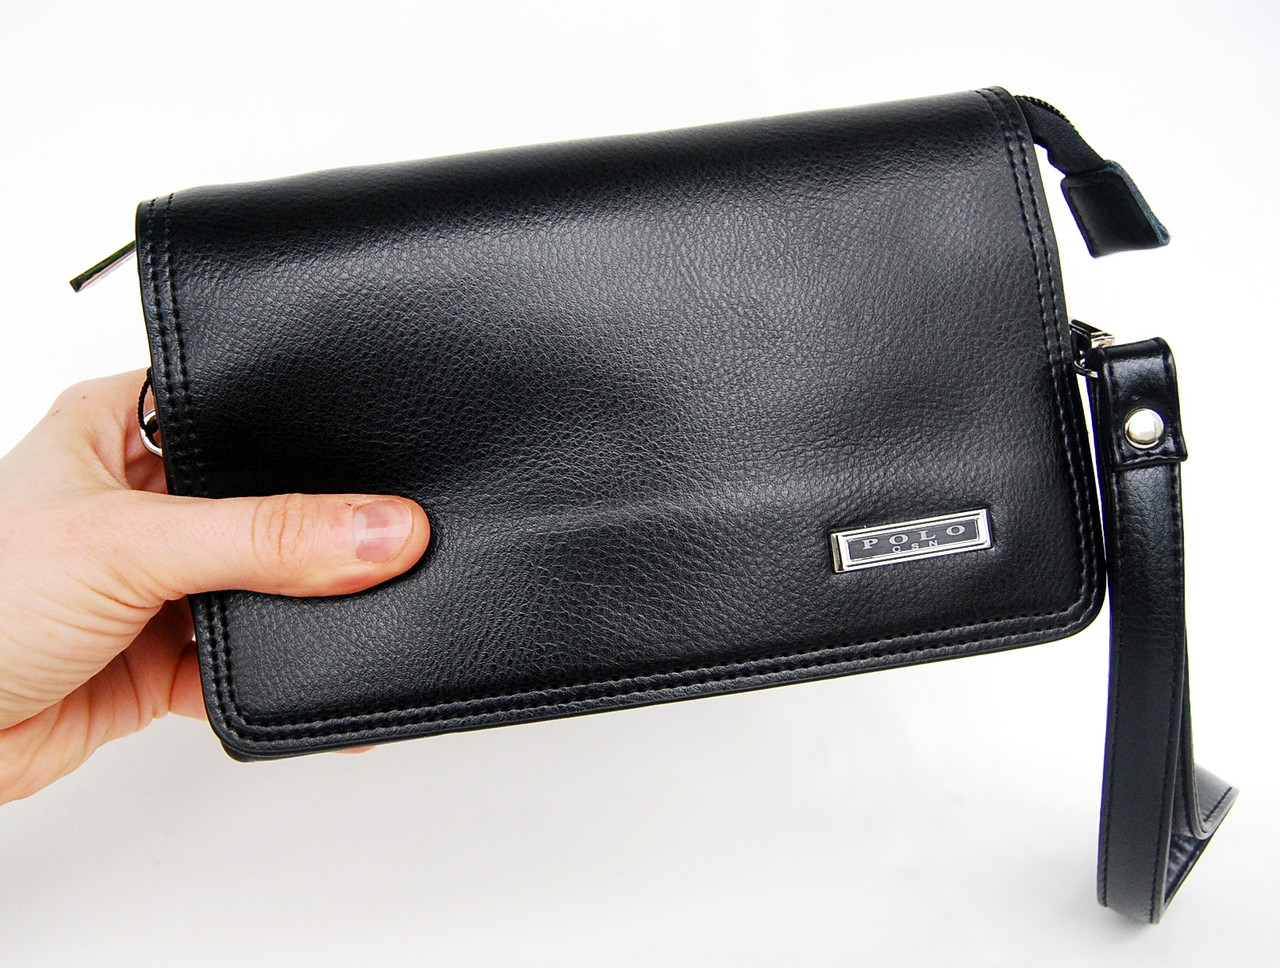 0e47e6ace5ff Качественная мужская сумка борсетка, клатч Polo. ЕК63: продажа, цена ...